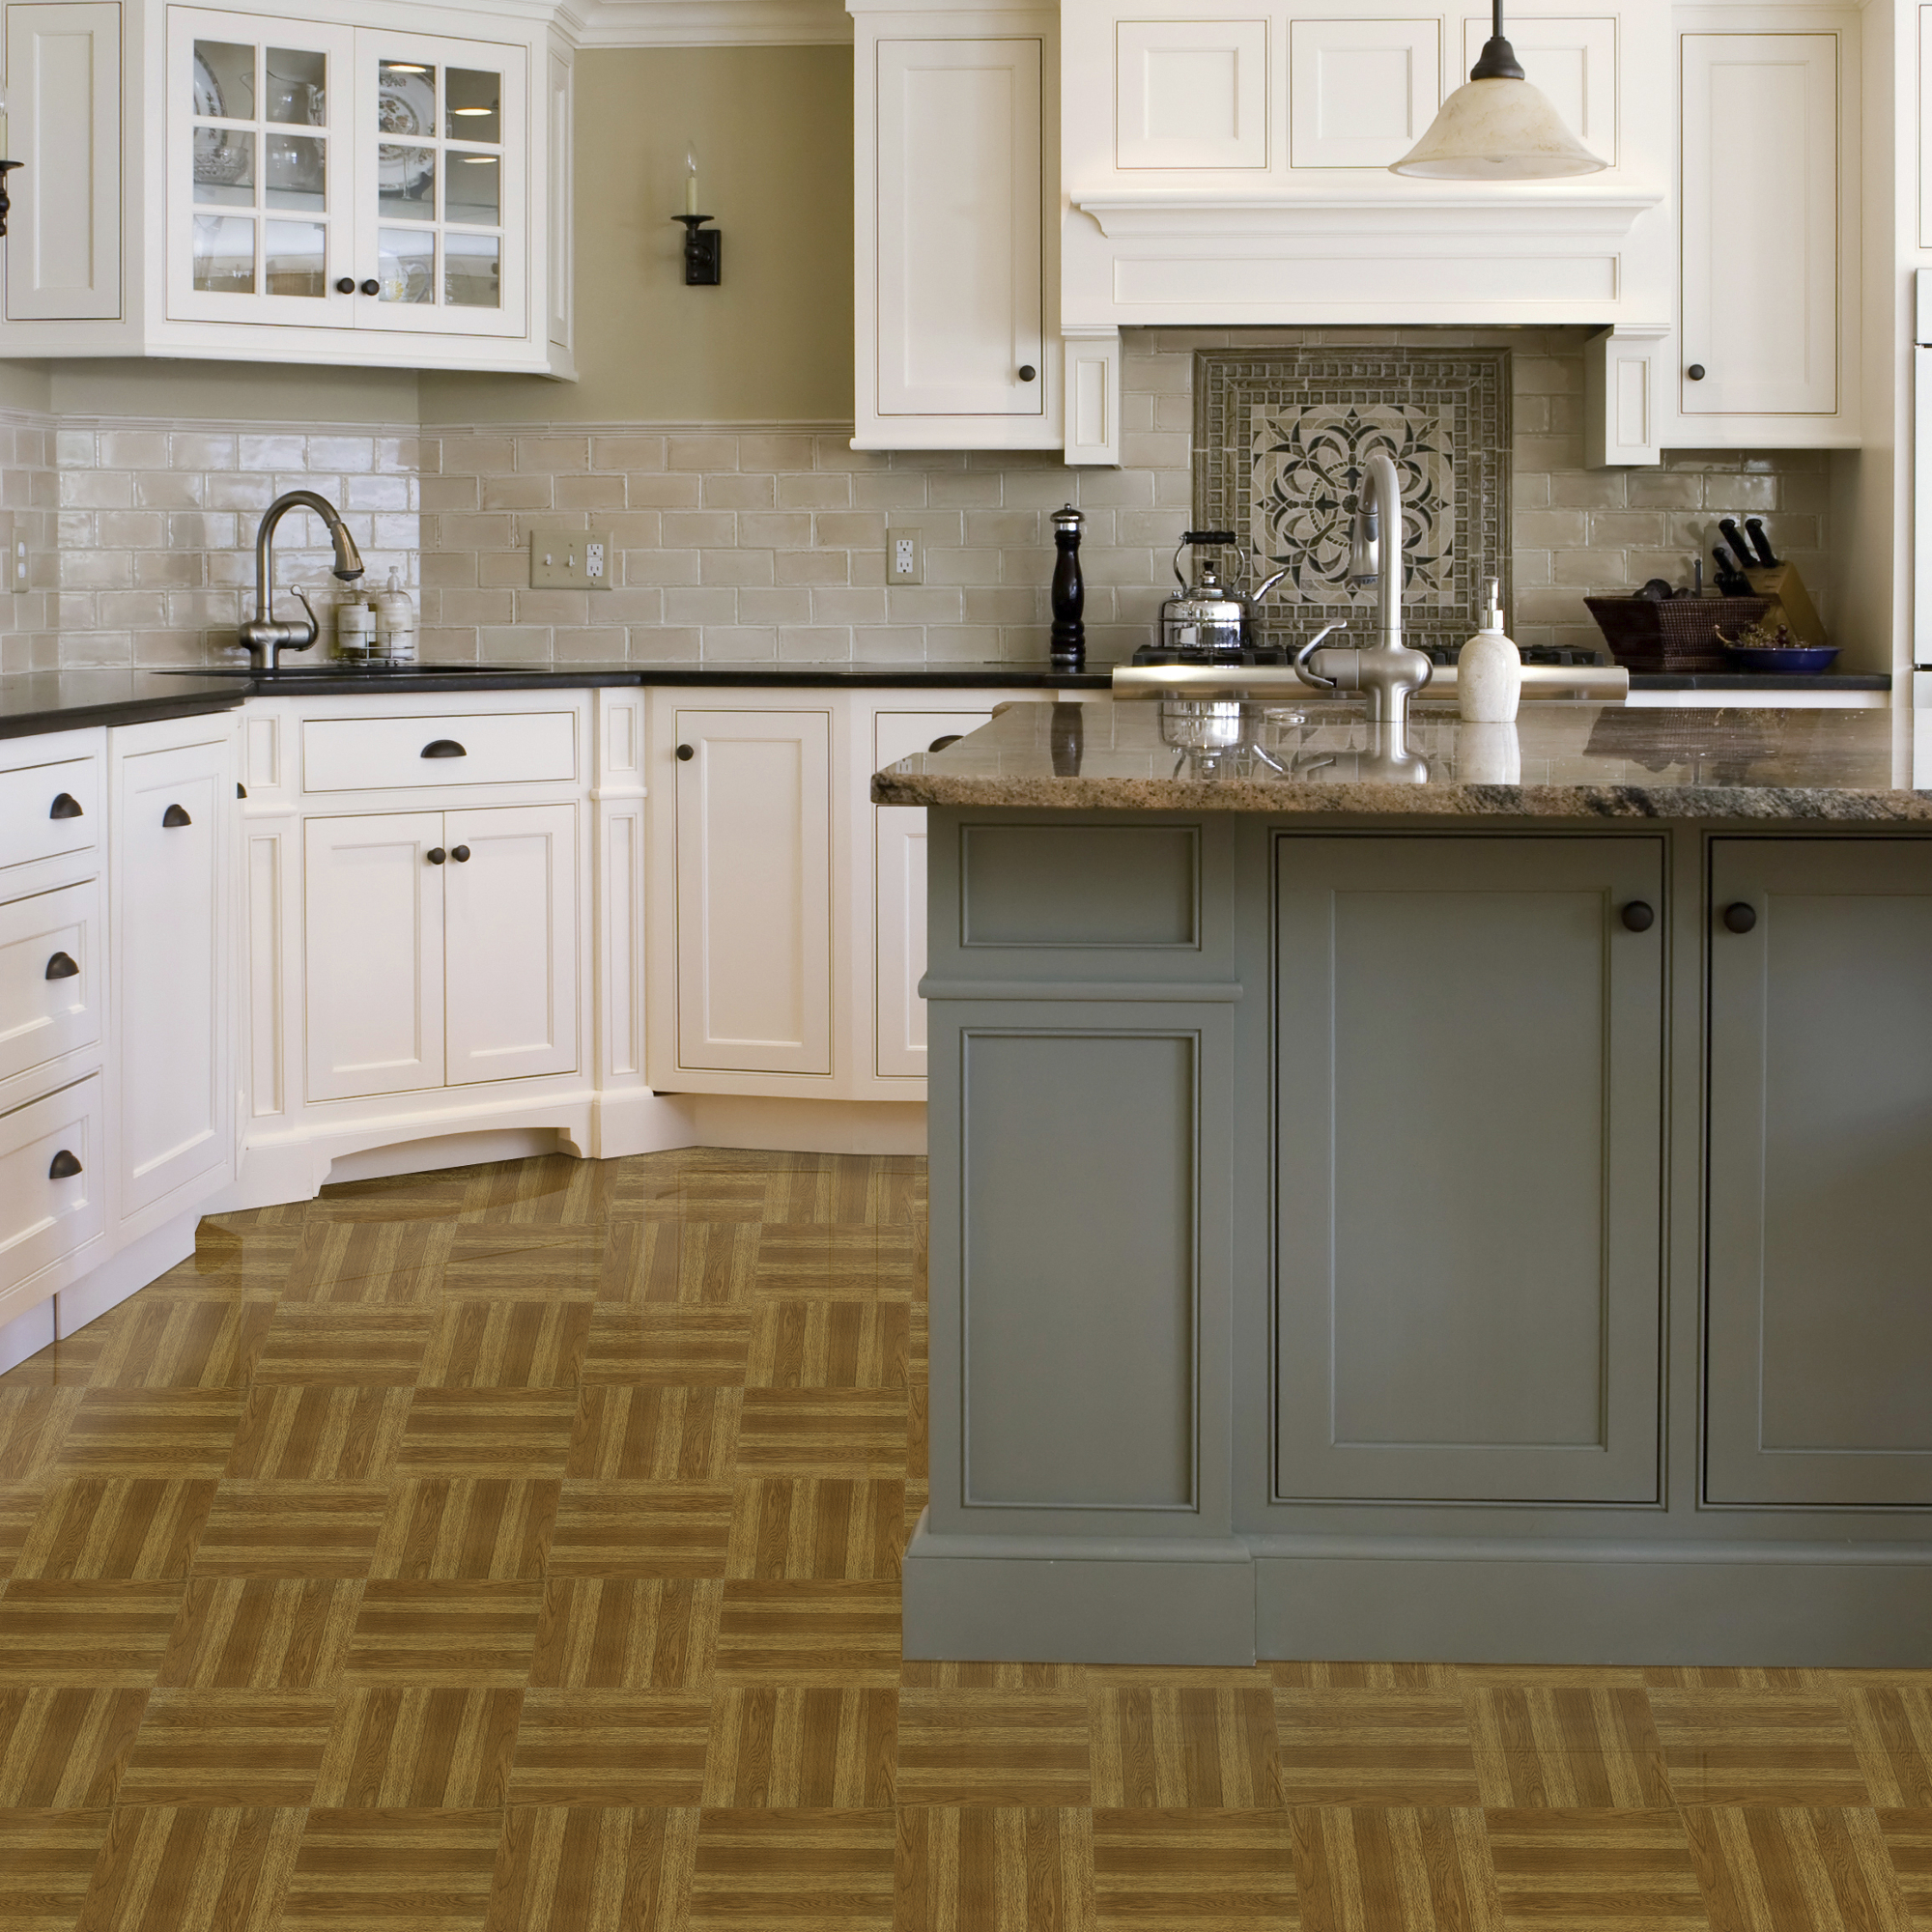 Nexus medium oak plank look 12x12 self adhesive vinyl floor tile nexus medium oak plank look 12x12 self adhesive vinyl floor tile 20 tiles20 sqft walmart dailygadgetfo Image collections